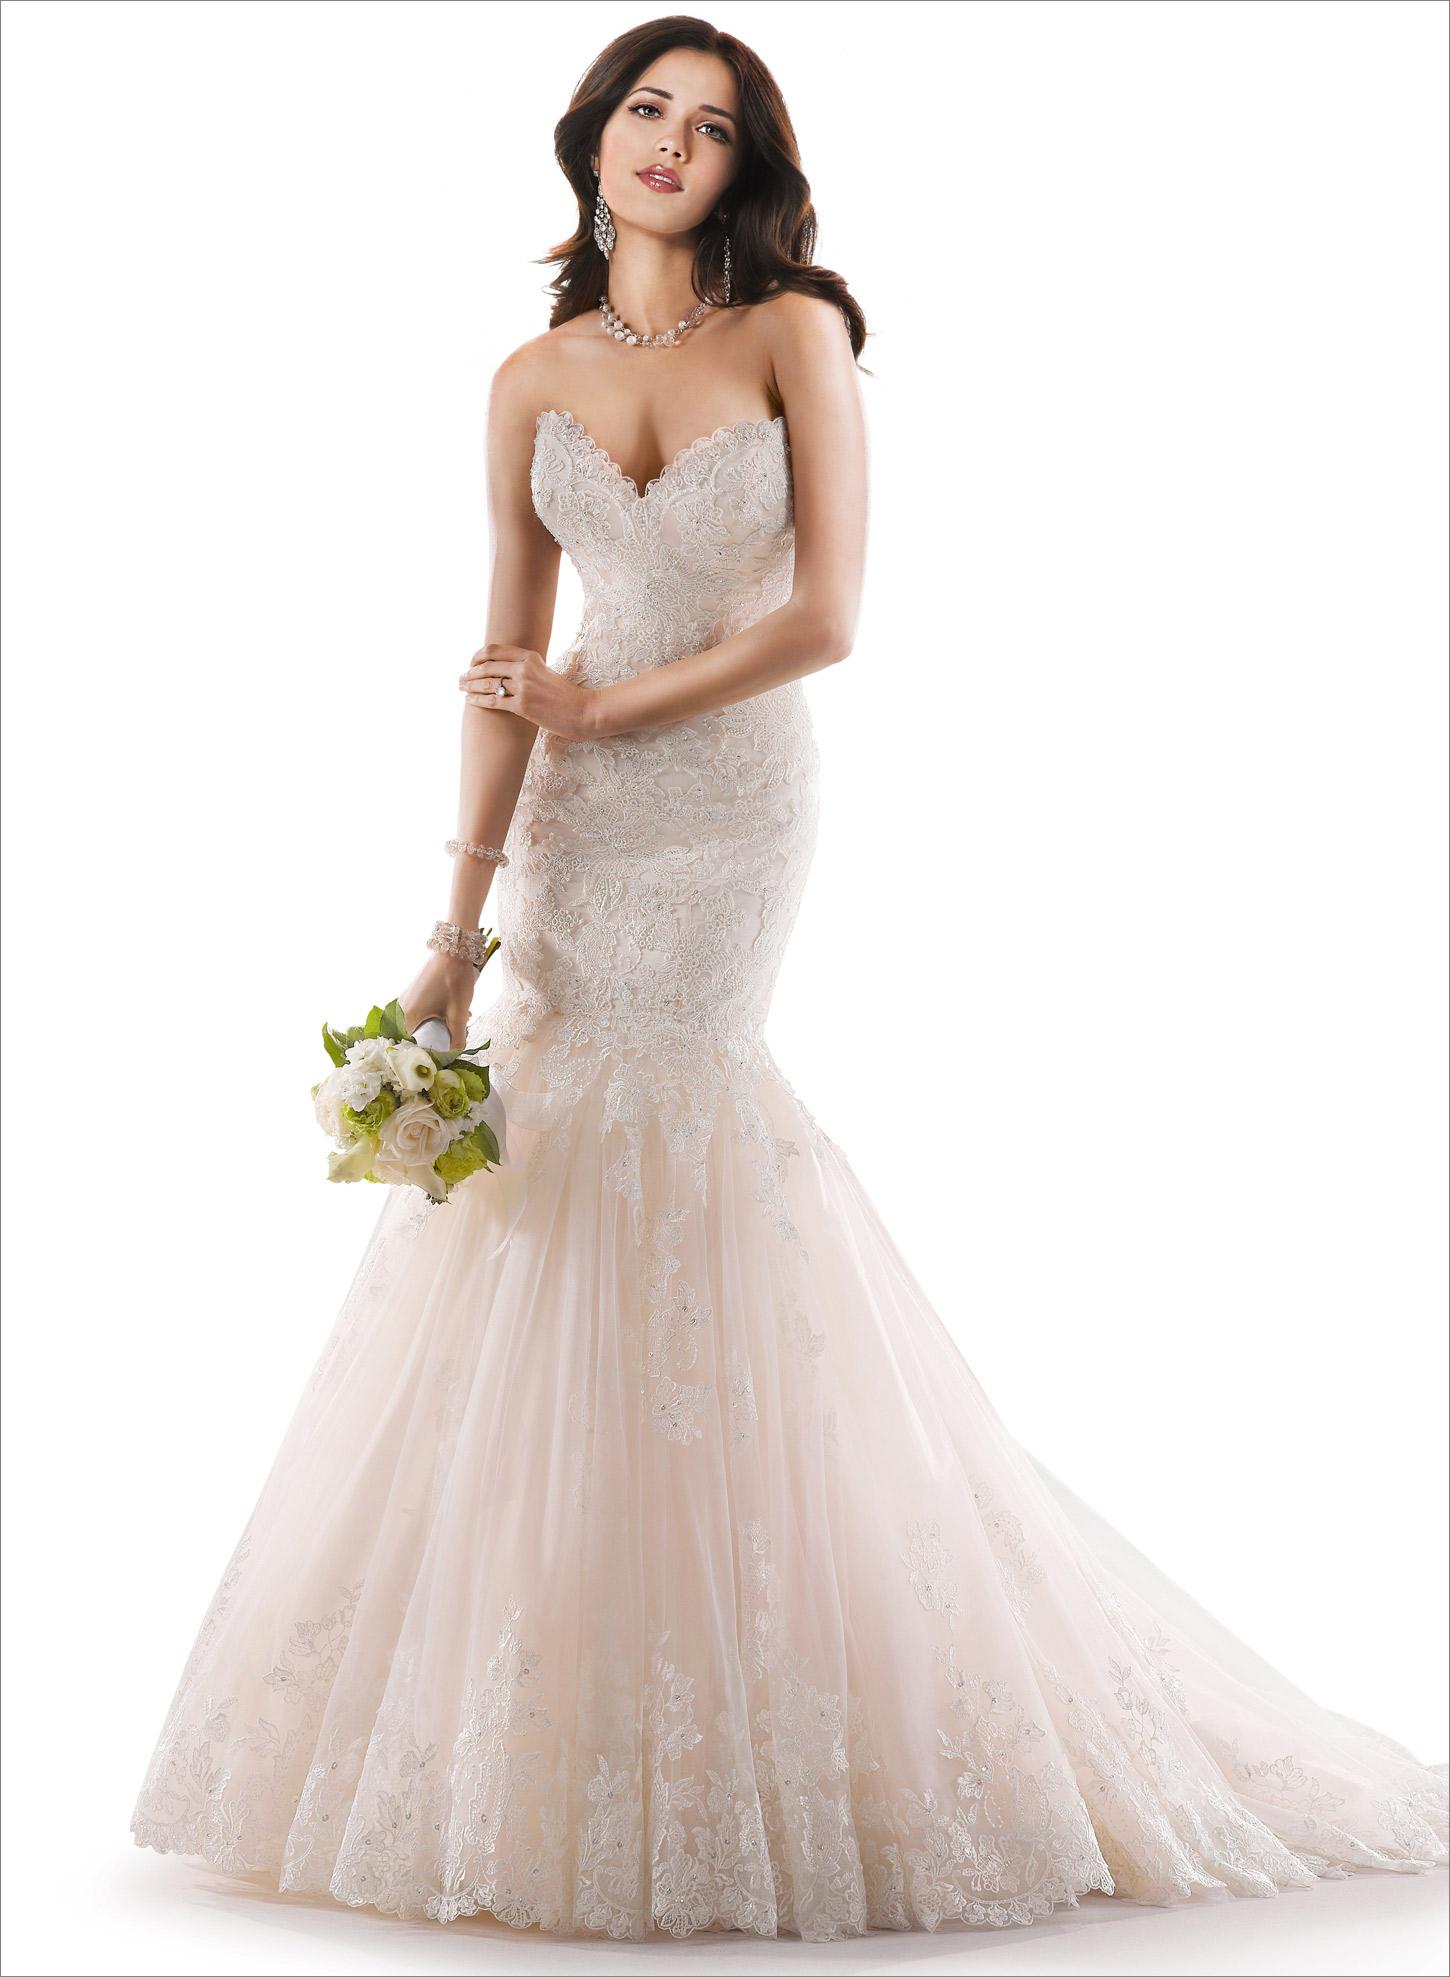 blush colored wedding dress blush colored wedding dresses Blush colored wedding dress